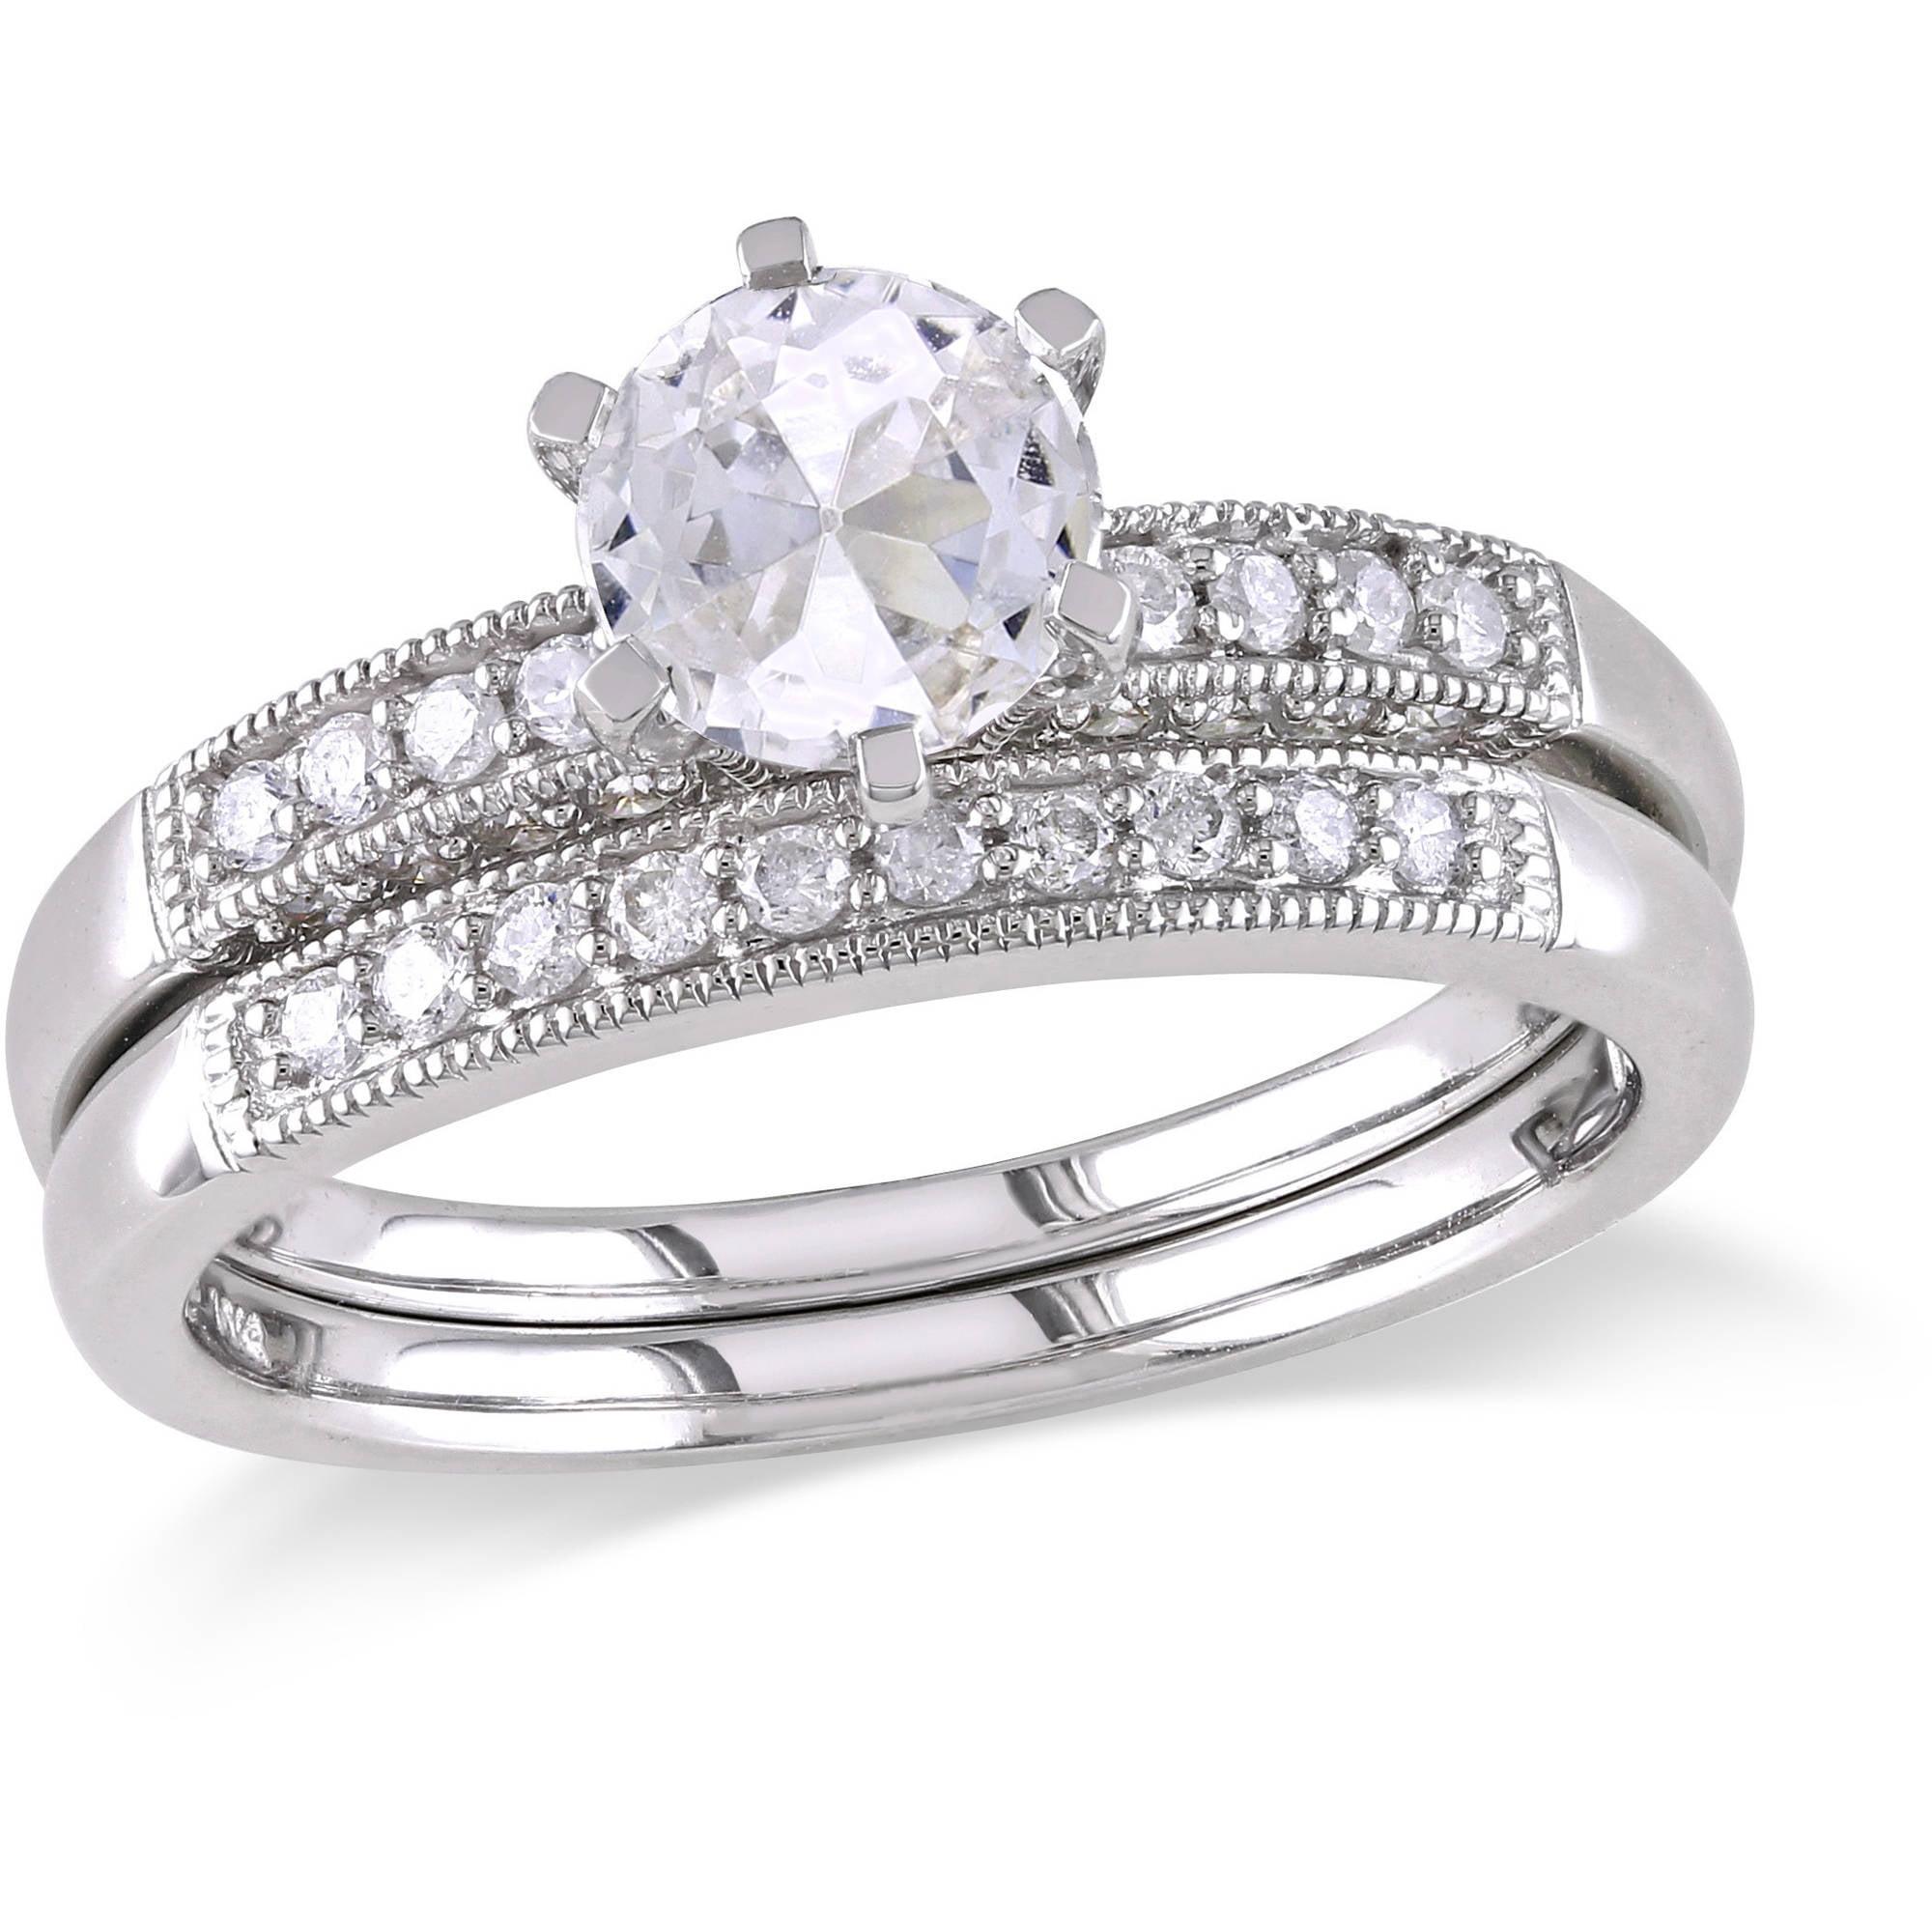 Miabella 1 Carat T.G.W. Created White Sapphire and 1 3 Carat T.W. Diamond 10kt White Gold Bridal Set by Generic